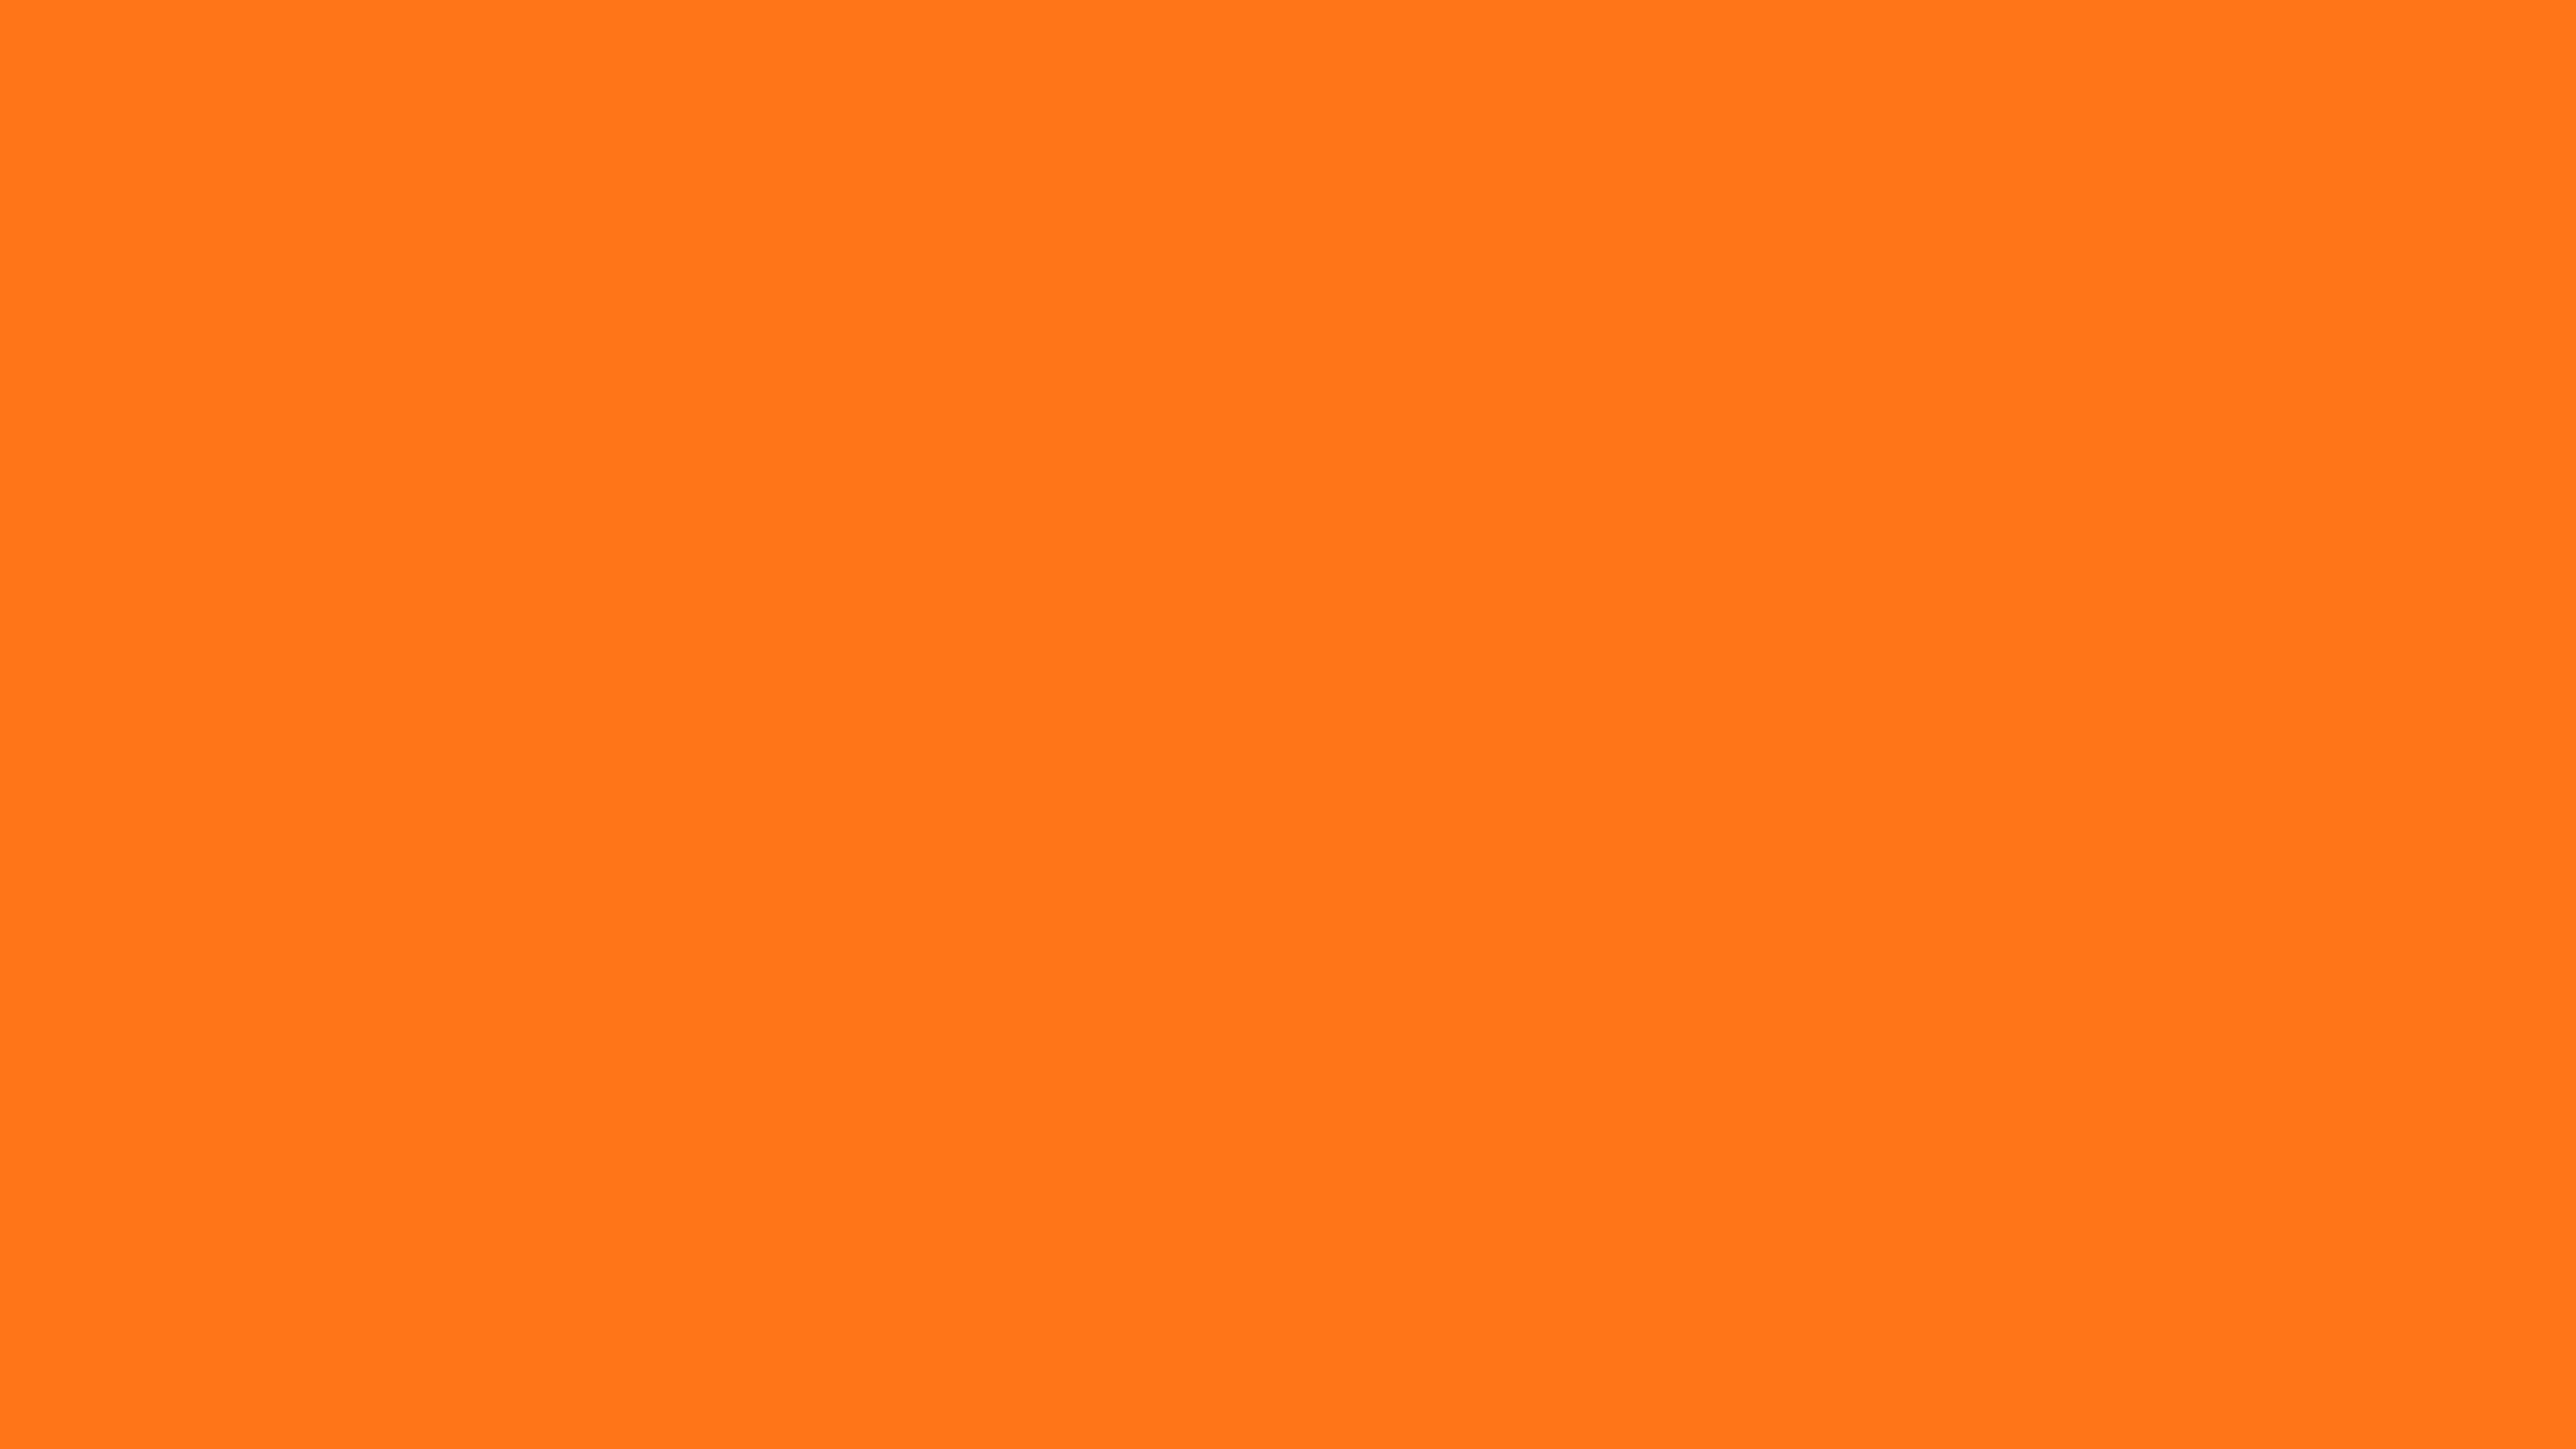 4096x2304 Pumpkin Solid Color Background